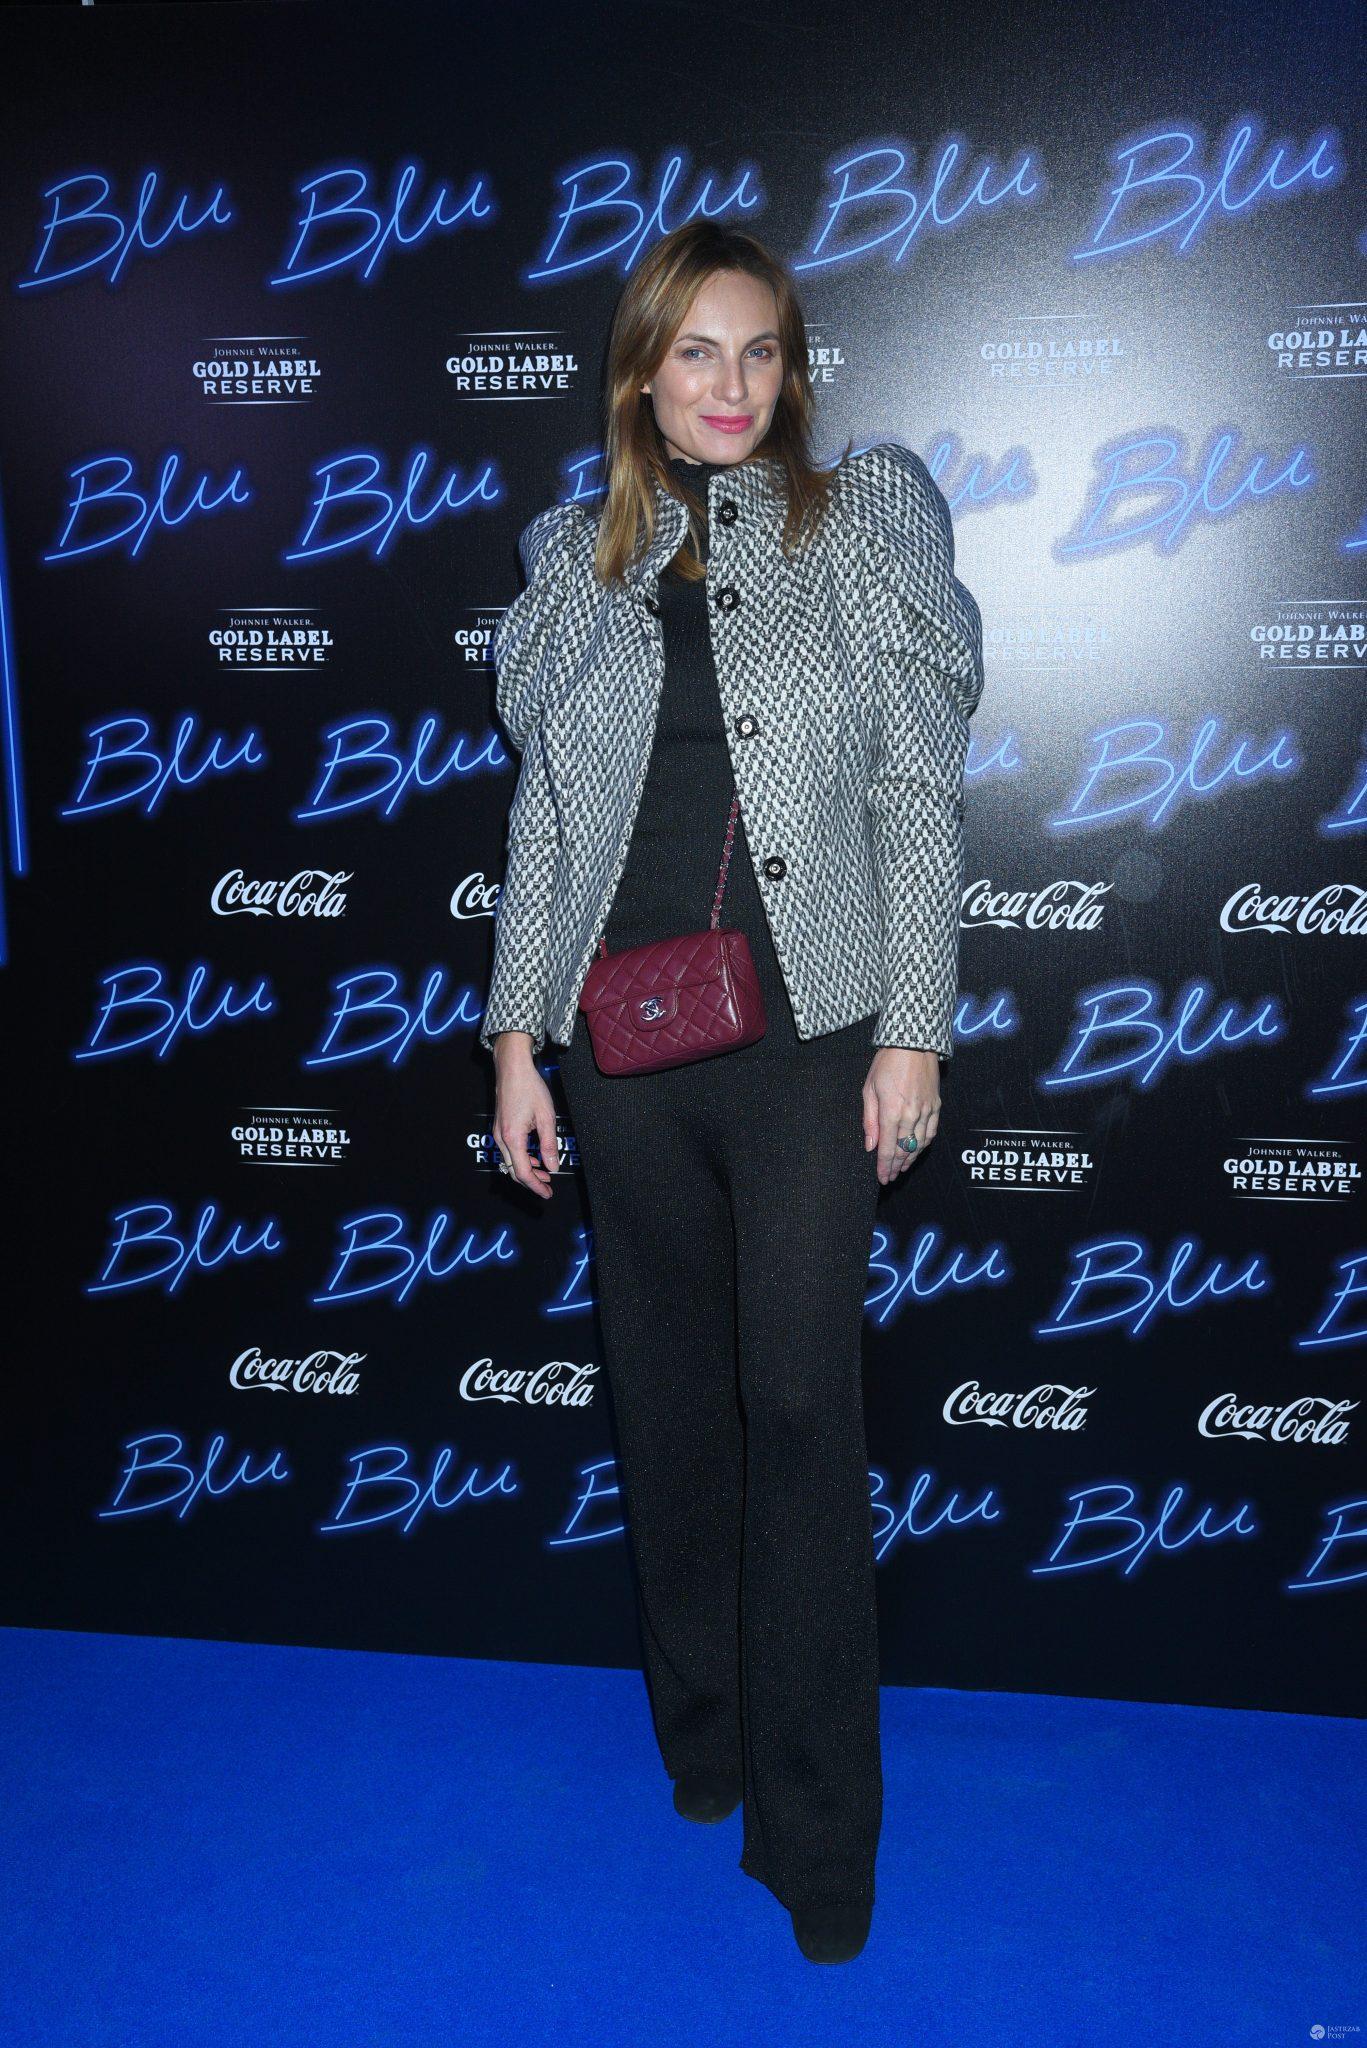 Sylwia Gliwa - otwarcie klubu Blu